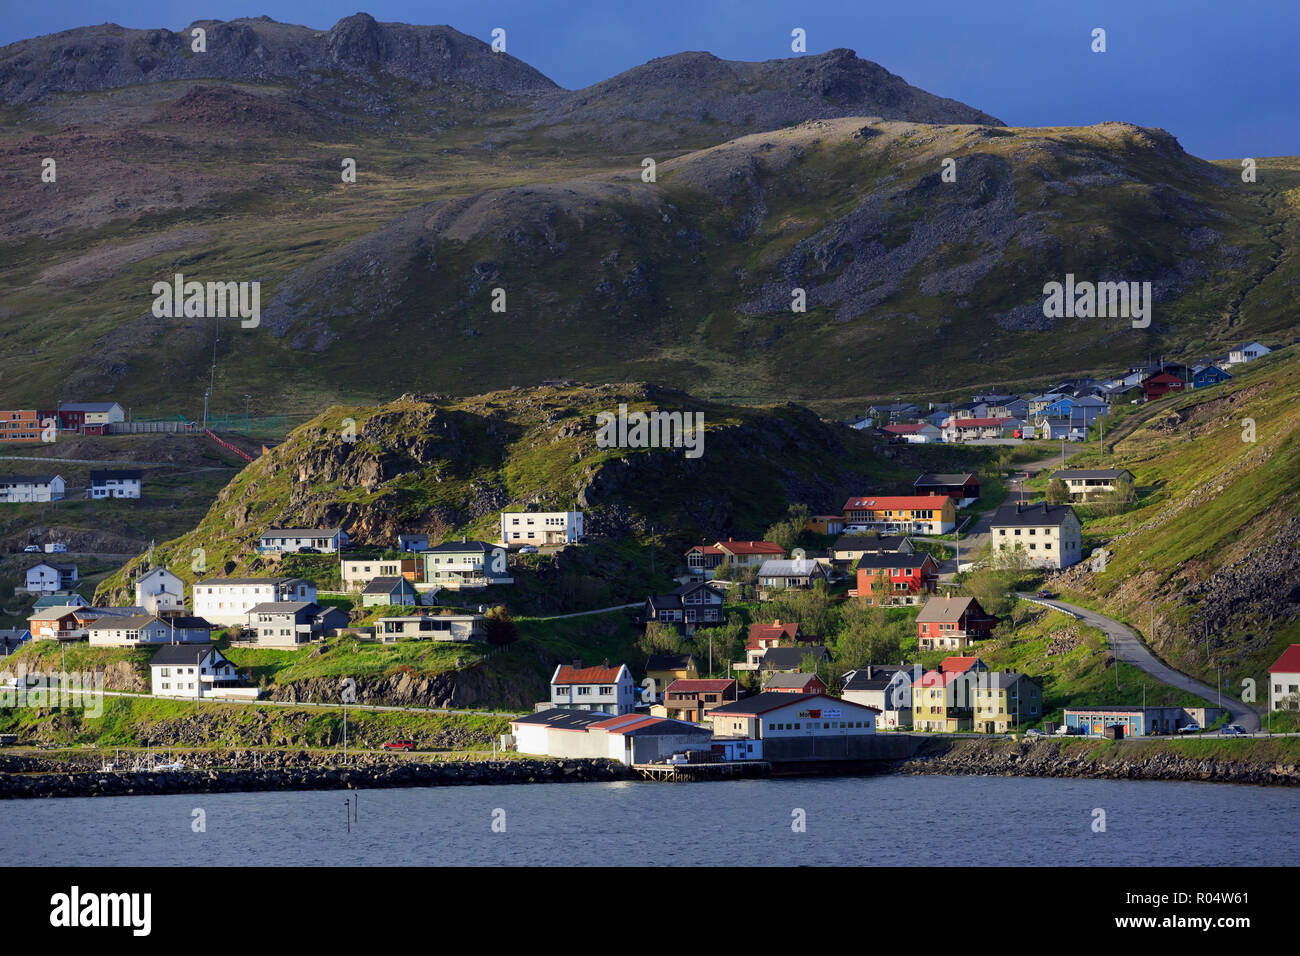 Honningsvag Town, Mageroya Island, Finnmark County, Norway, Scandinavia, Europe - Stock Image